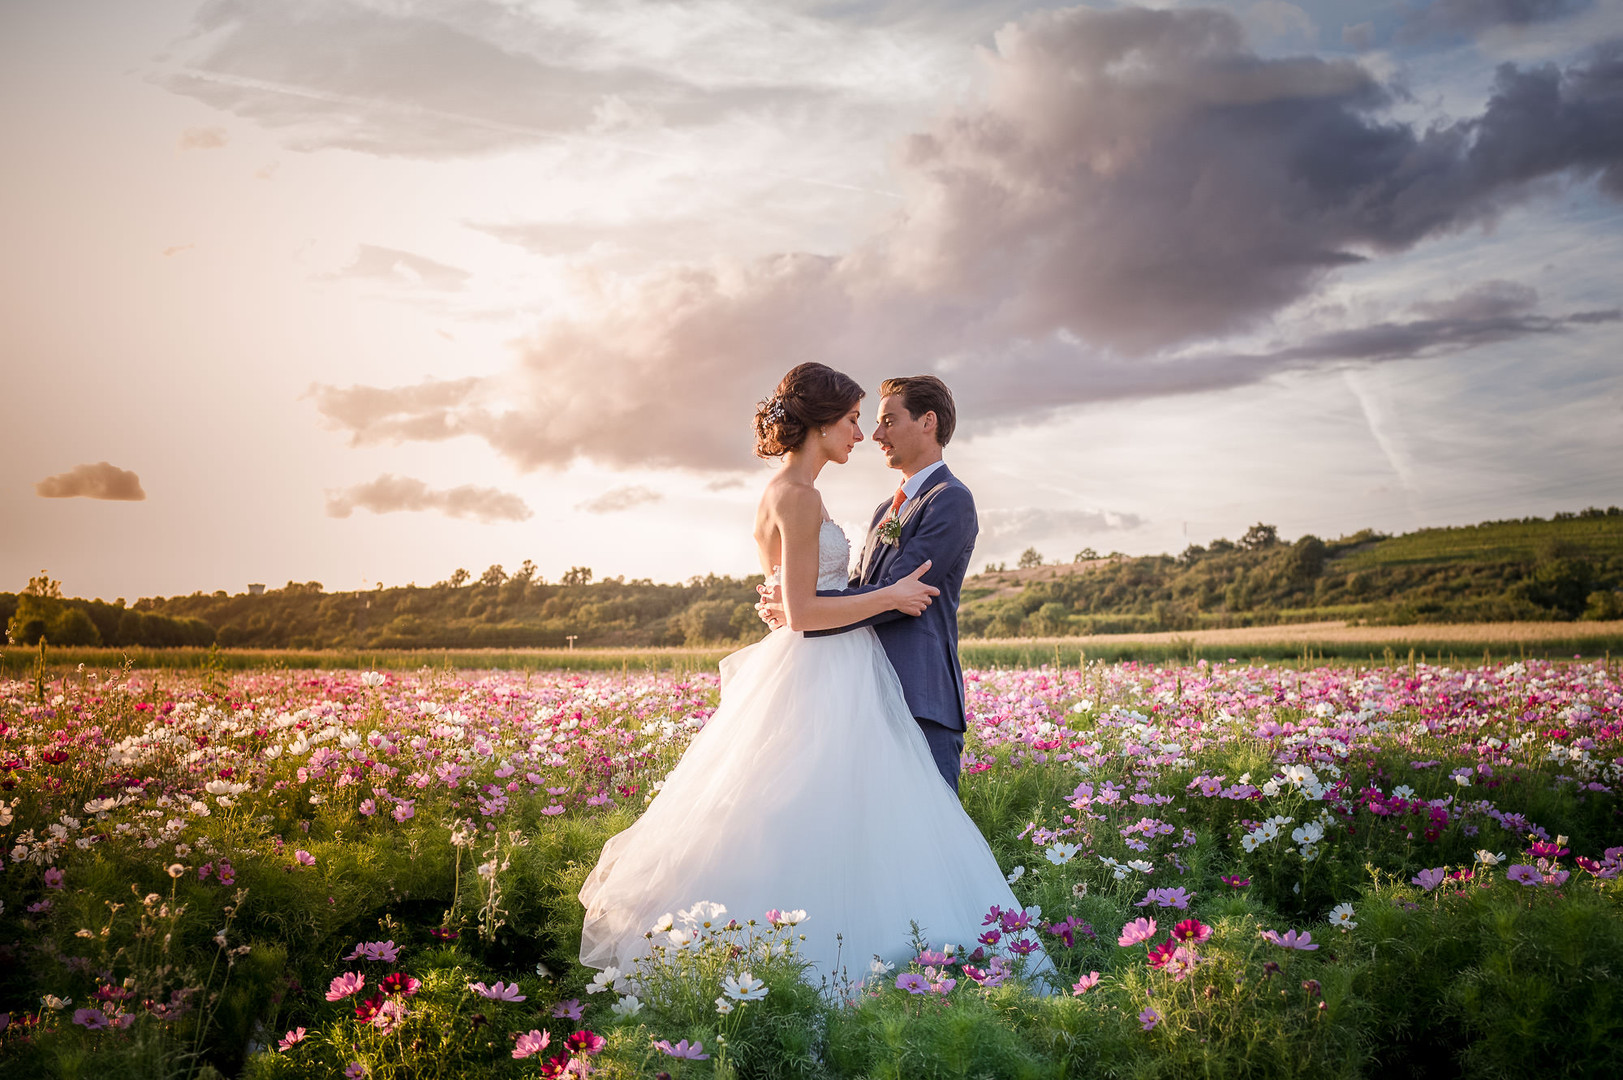 photographe Angers mariage layon Lys Aubance